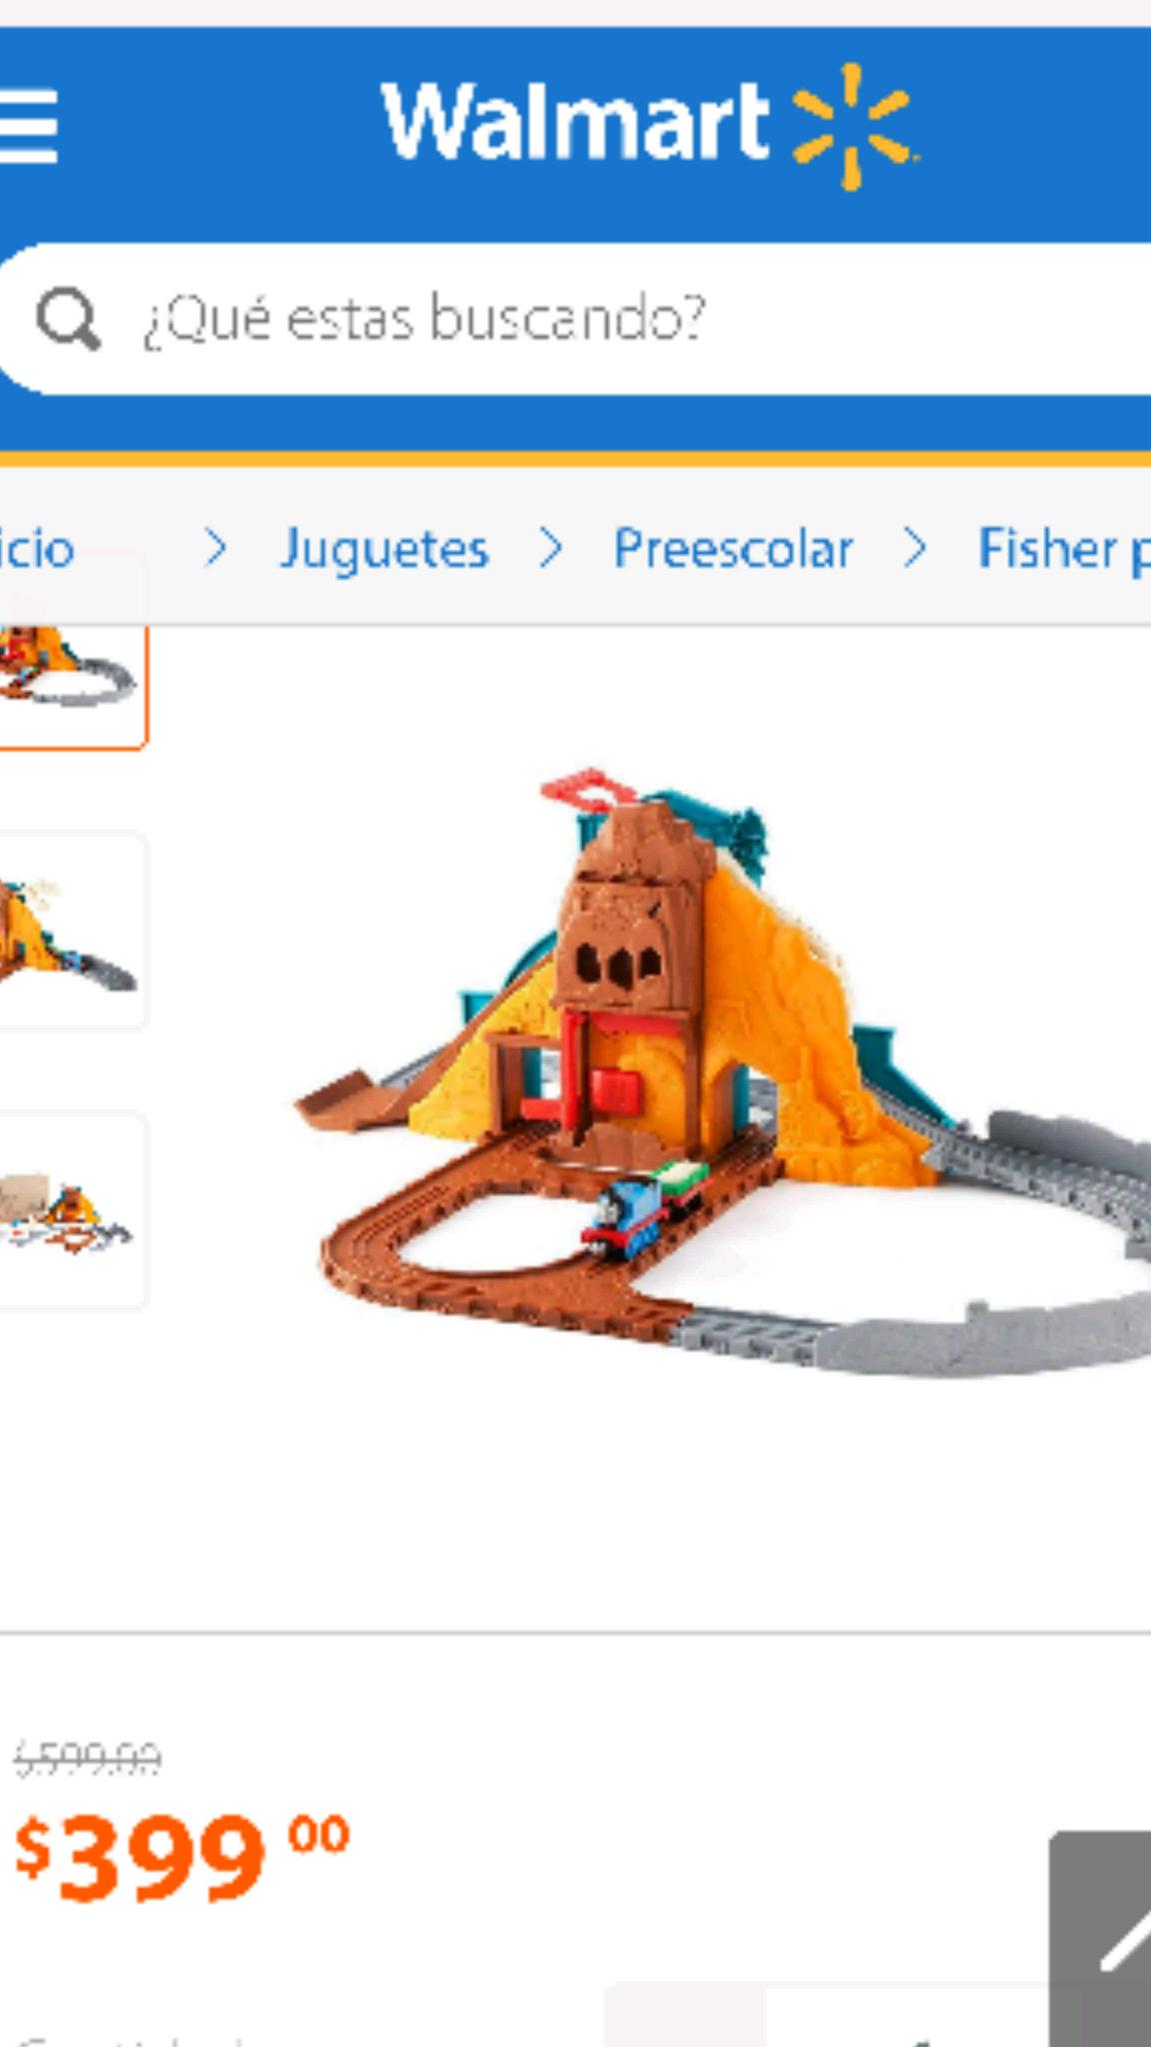 Walmart en línea: Thomas Take & Play Pista Dinosaurio Feroz a $399